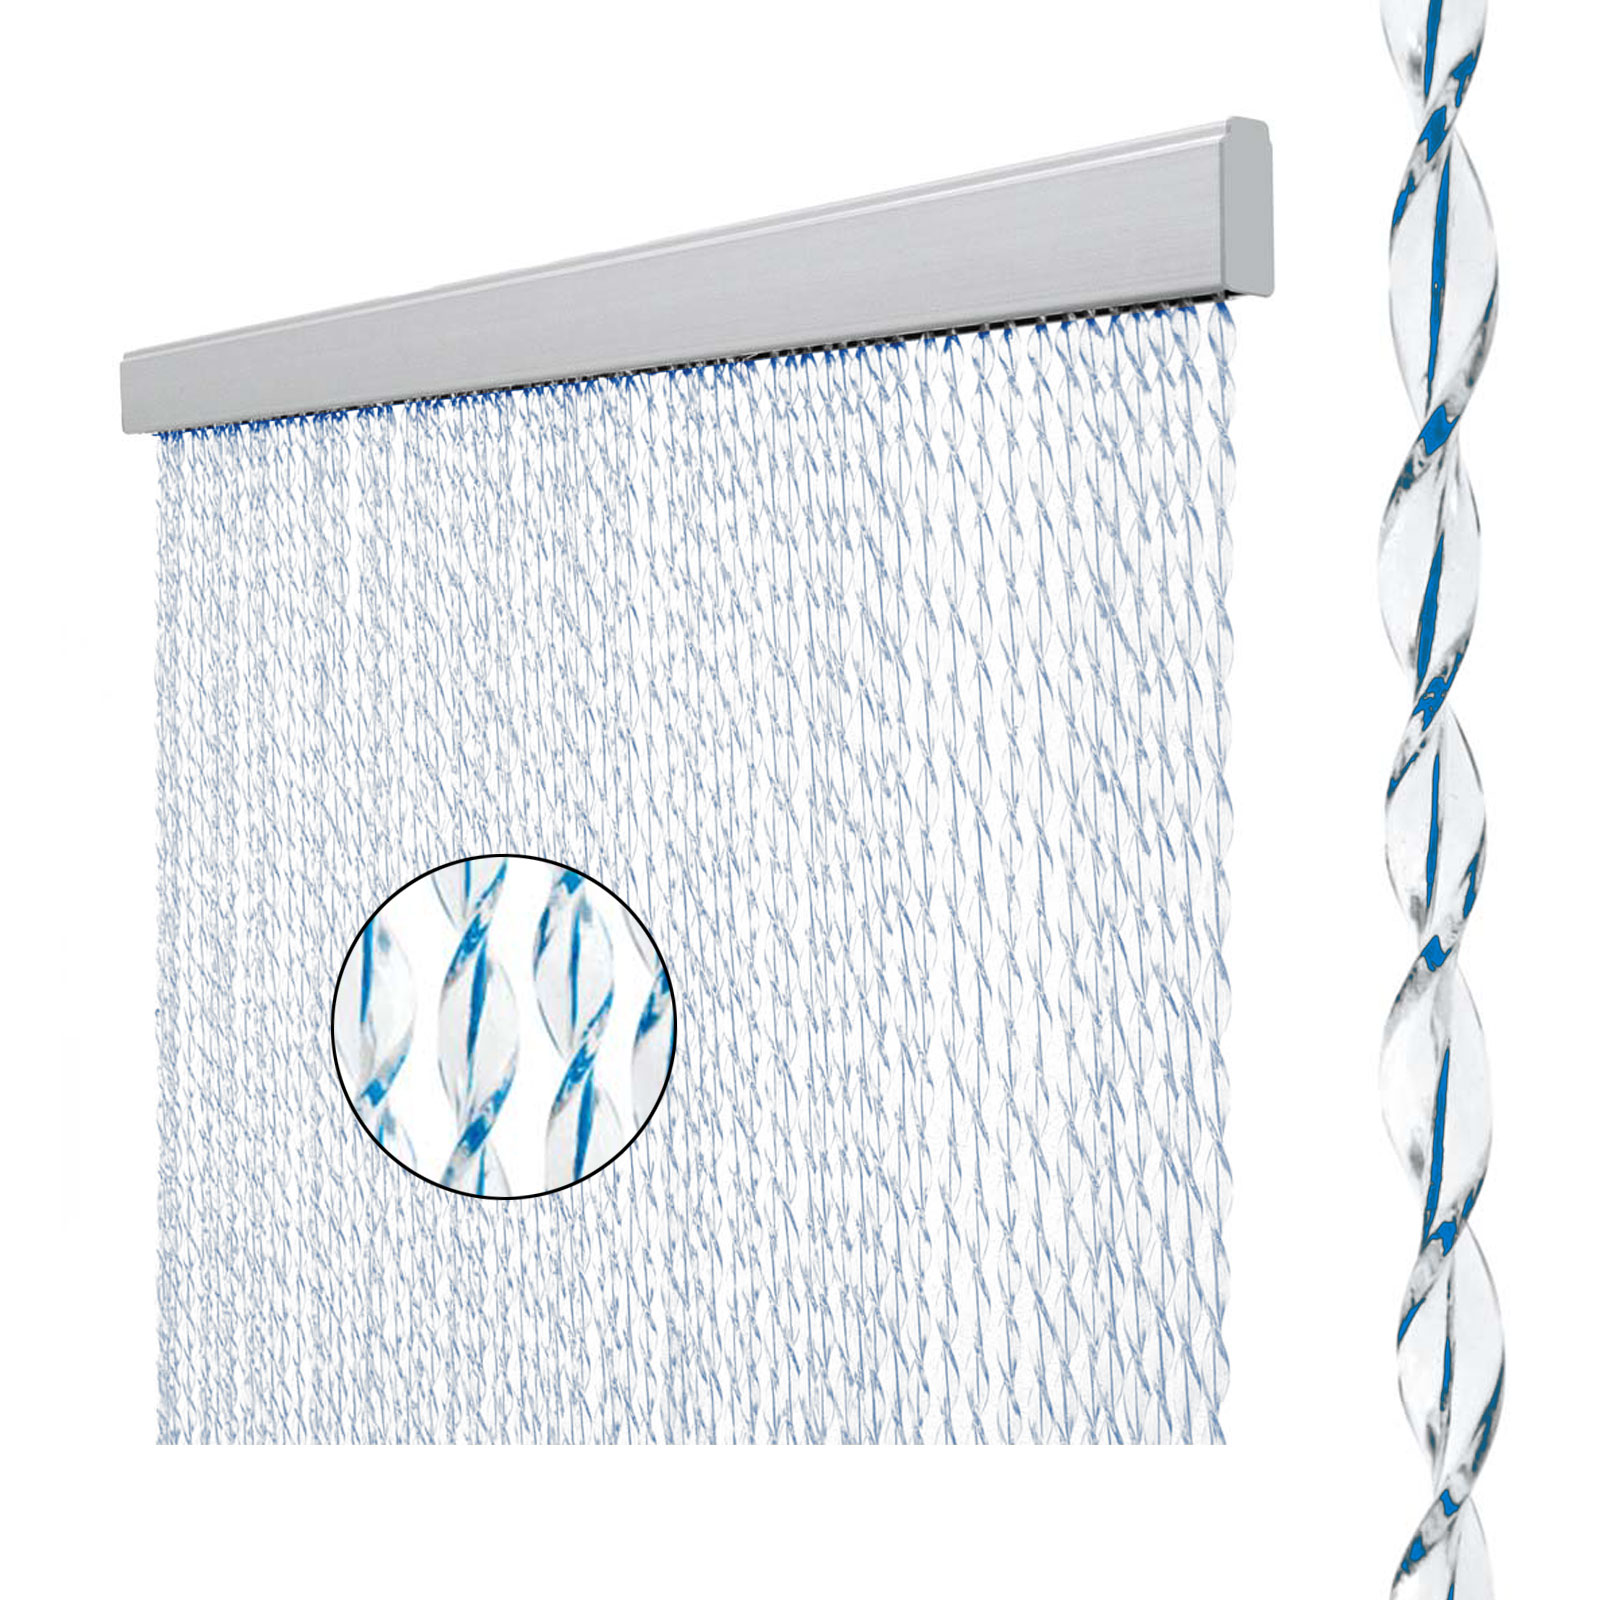 Vorhang Sara, 100% PVC, 60x190 cm, weiß/blau